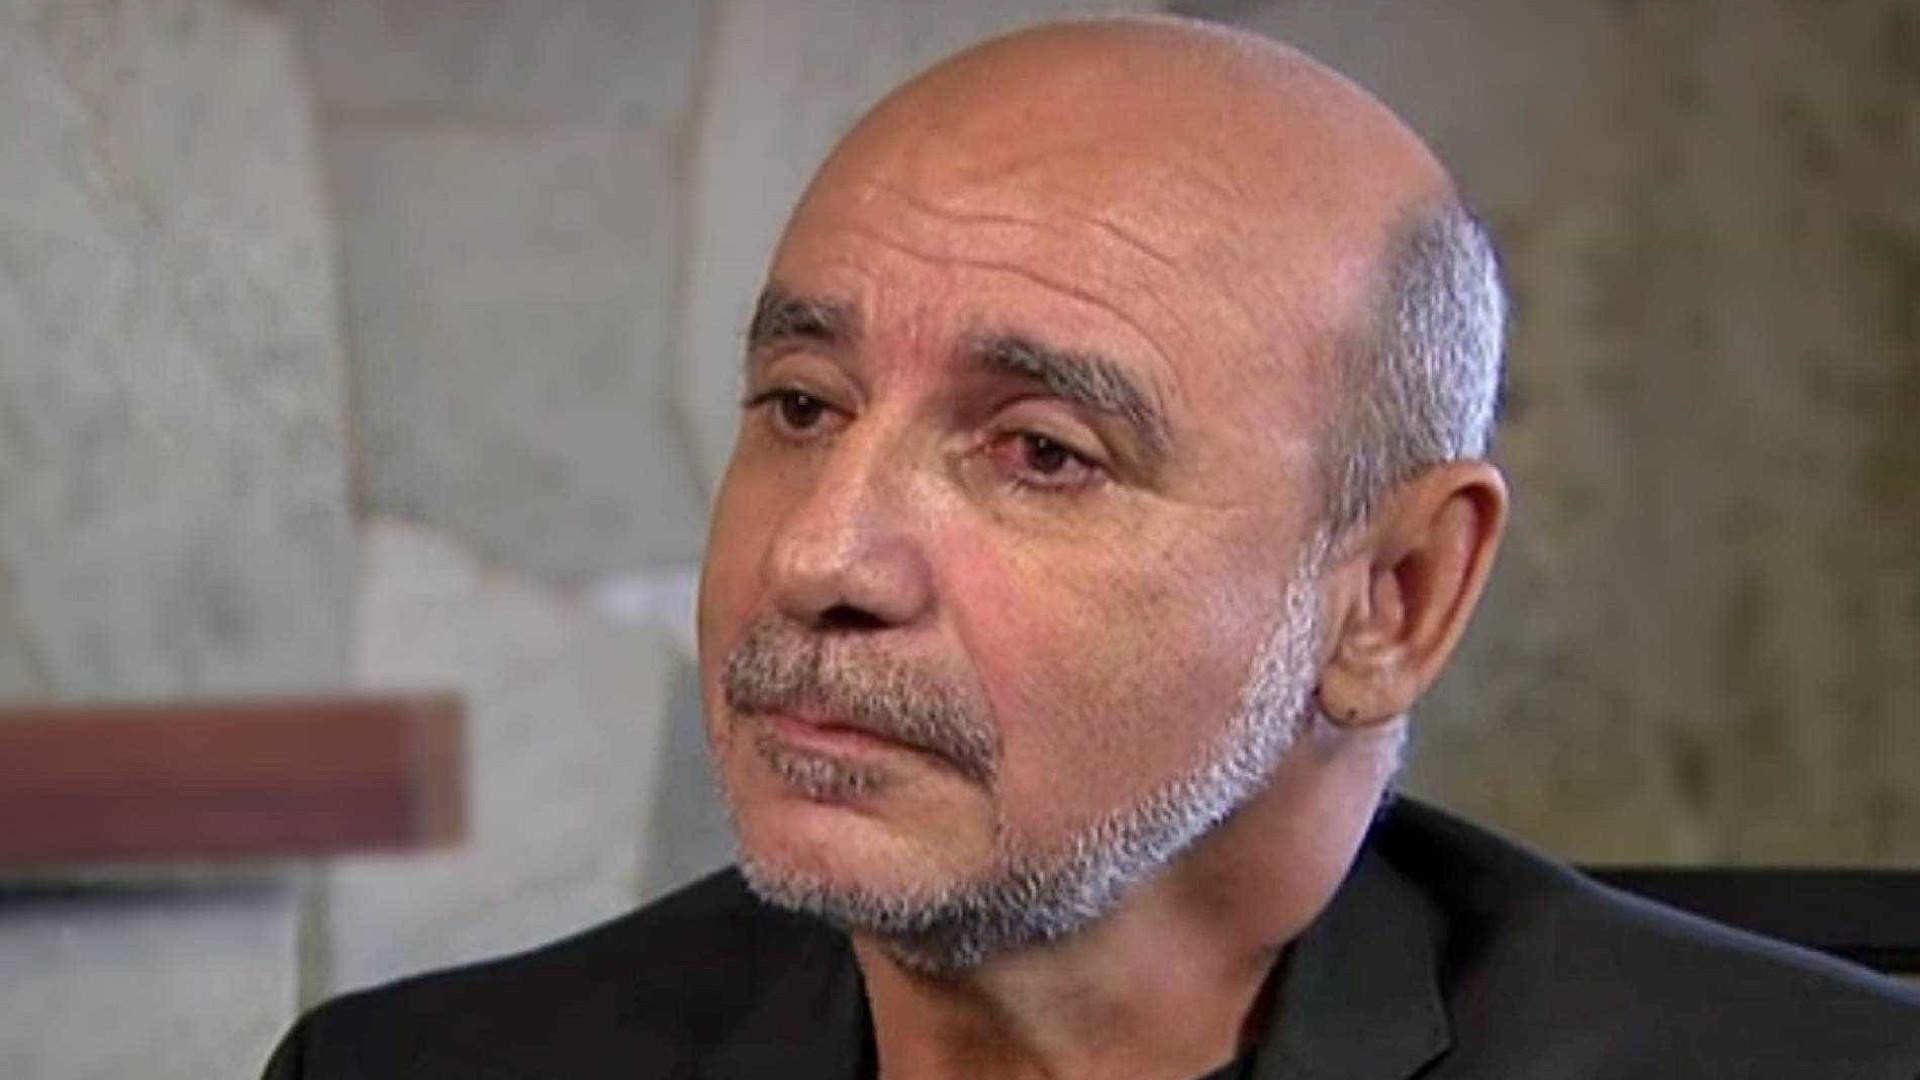 Caso Queiroz: MP pode denunciar envolvidos mesmo sem depoimentos